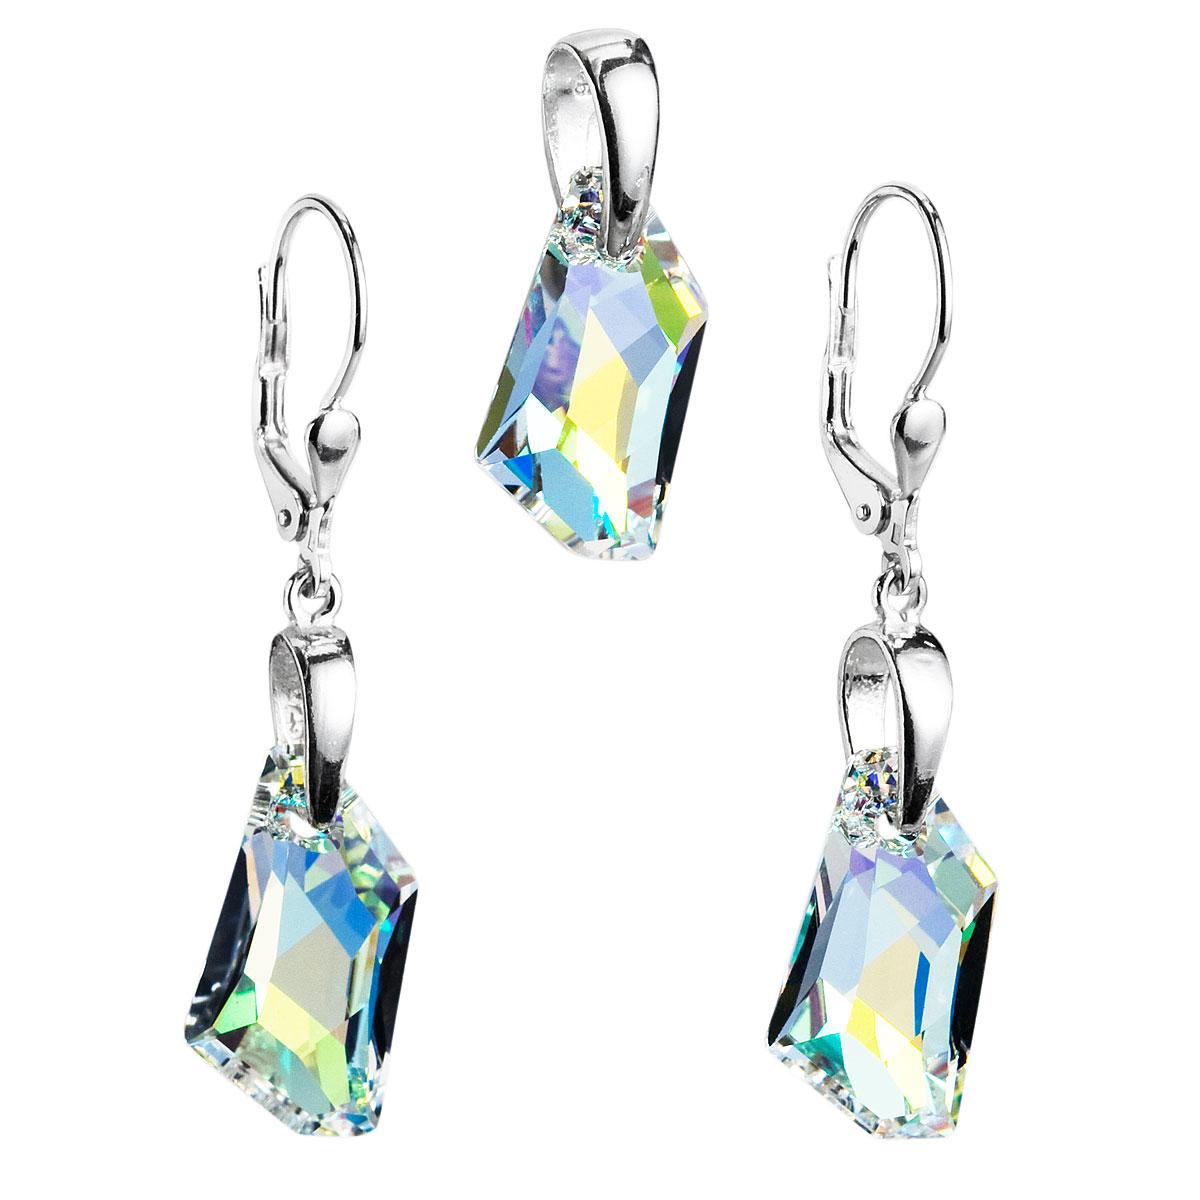 Sada šperků s krystaly Swarovski náušnice a přívěsek AB efekt bílý krystal  39039.2 3edb0856e8d